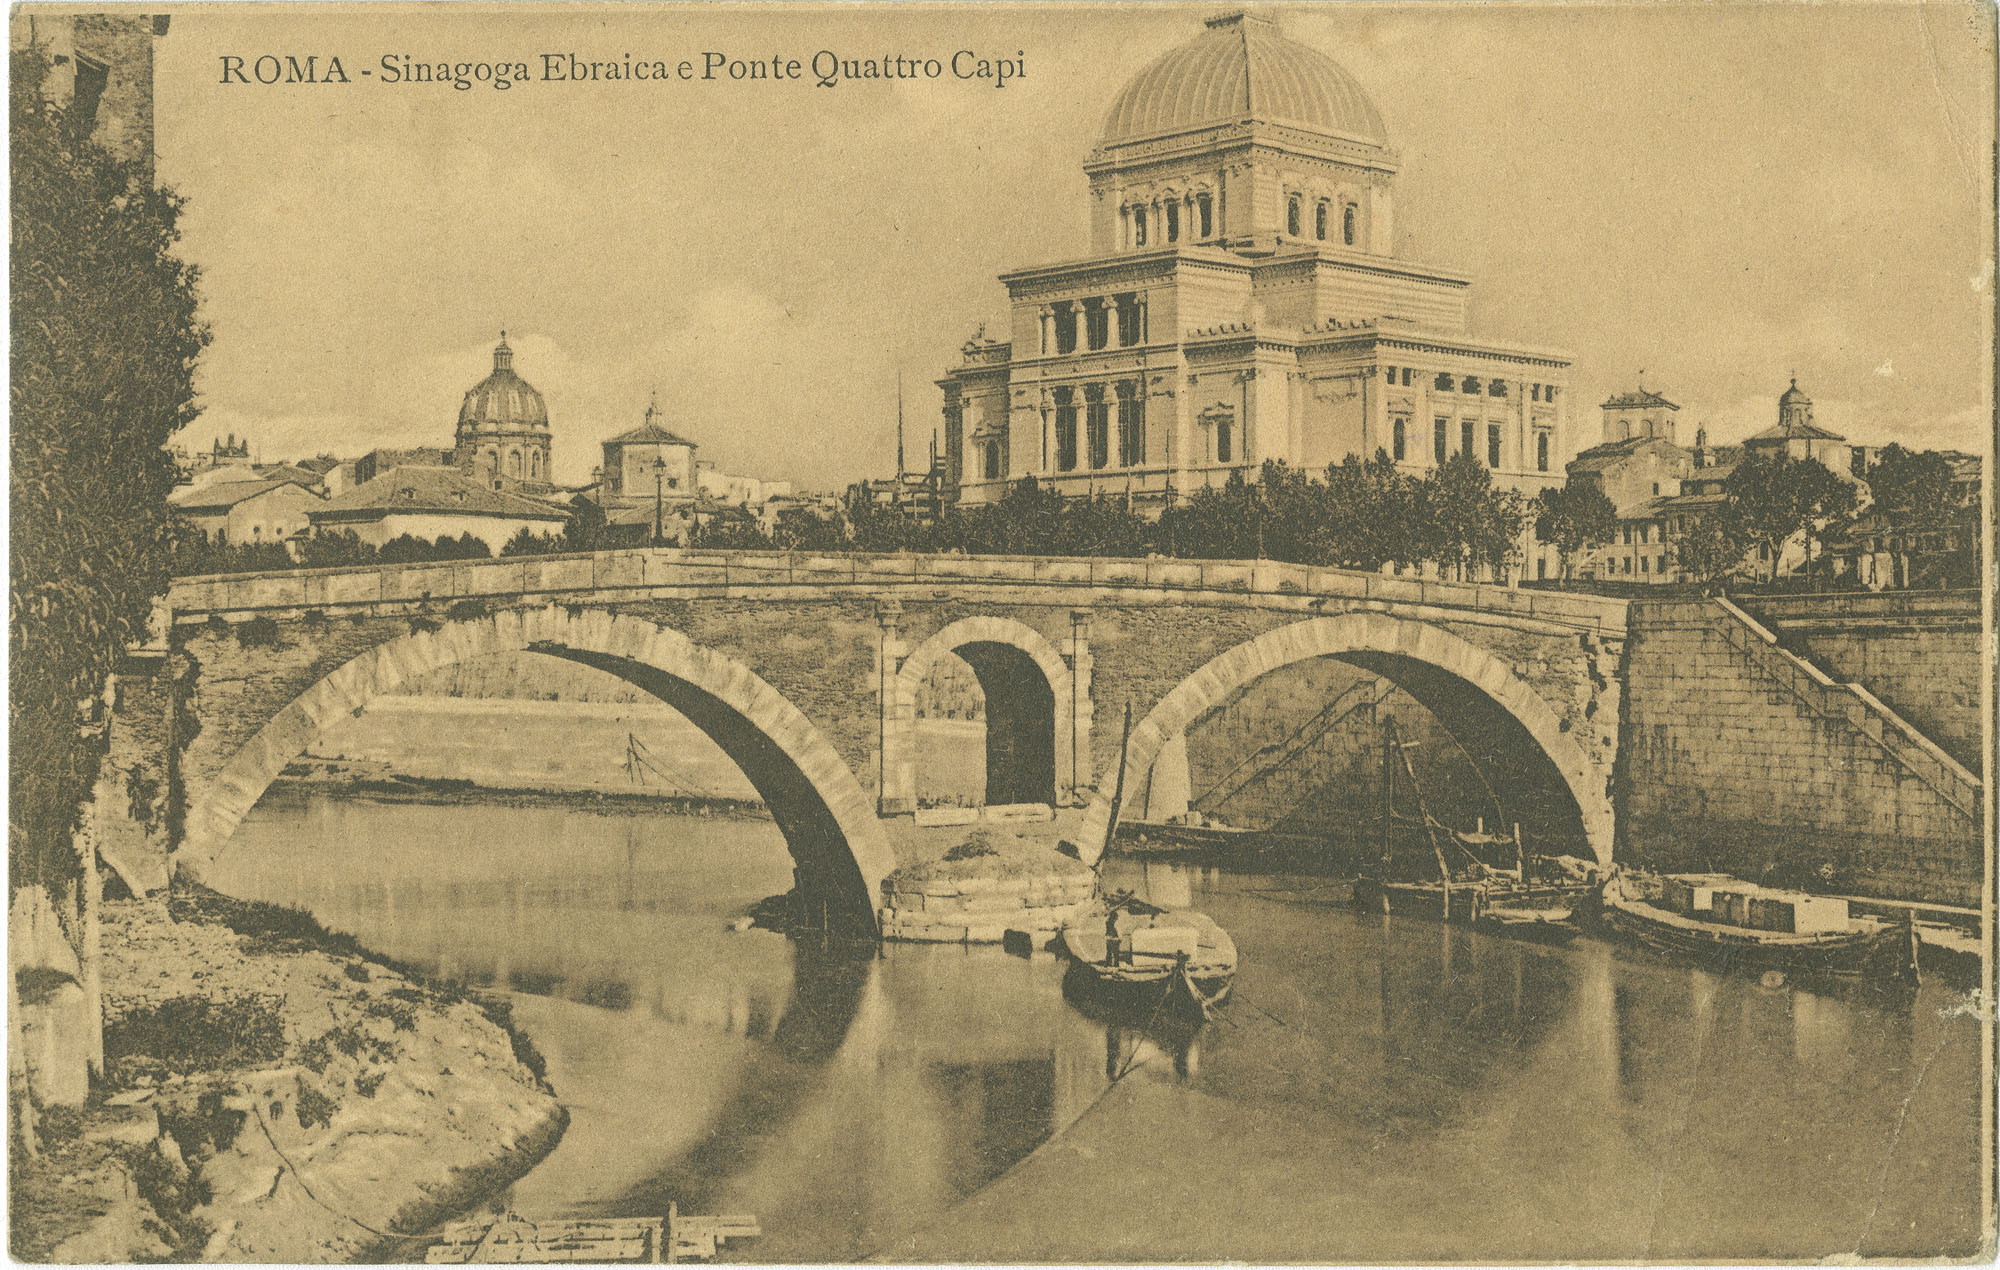 Roma - Sinagoga Ebraica e Ponte Quattro Capi